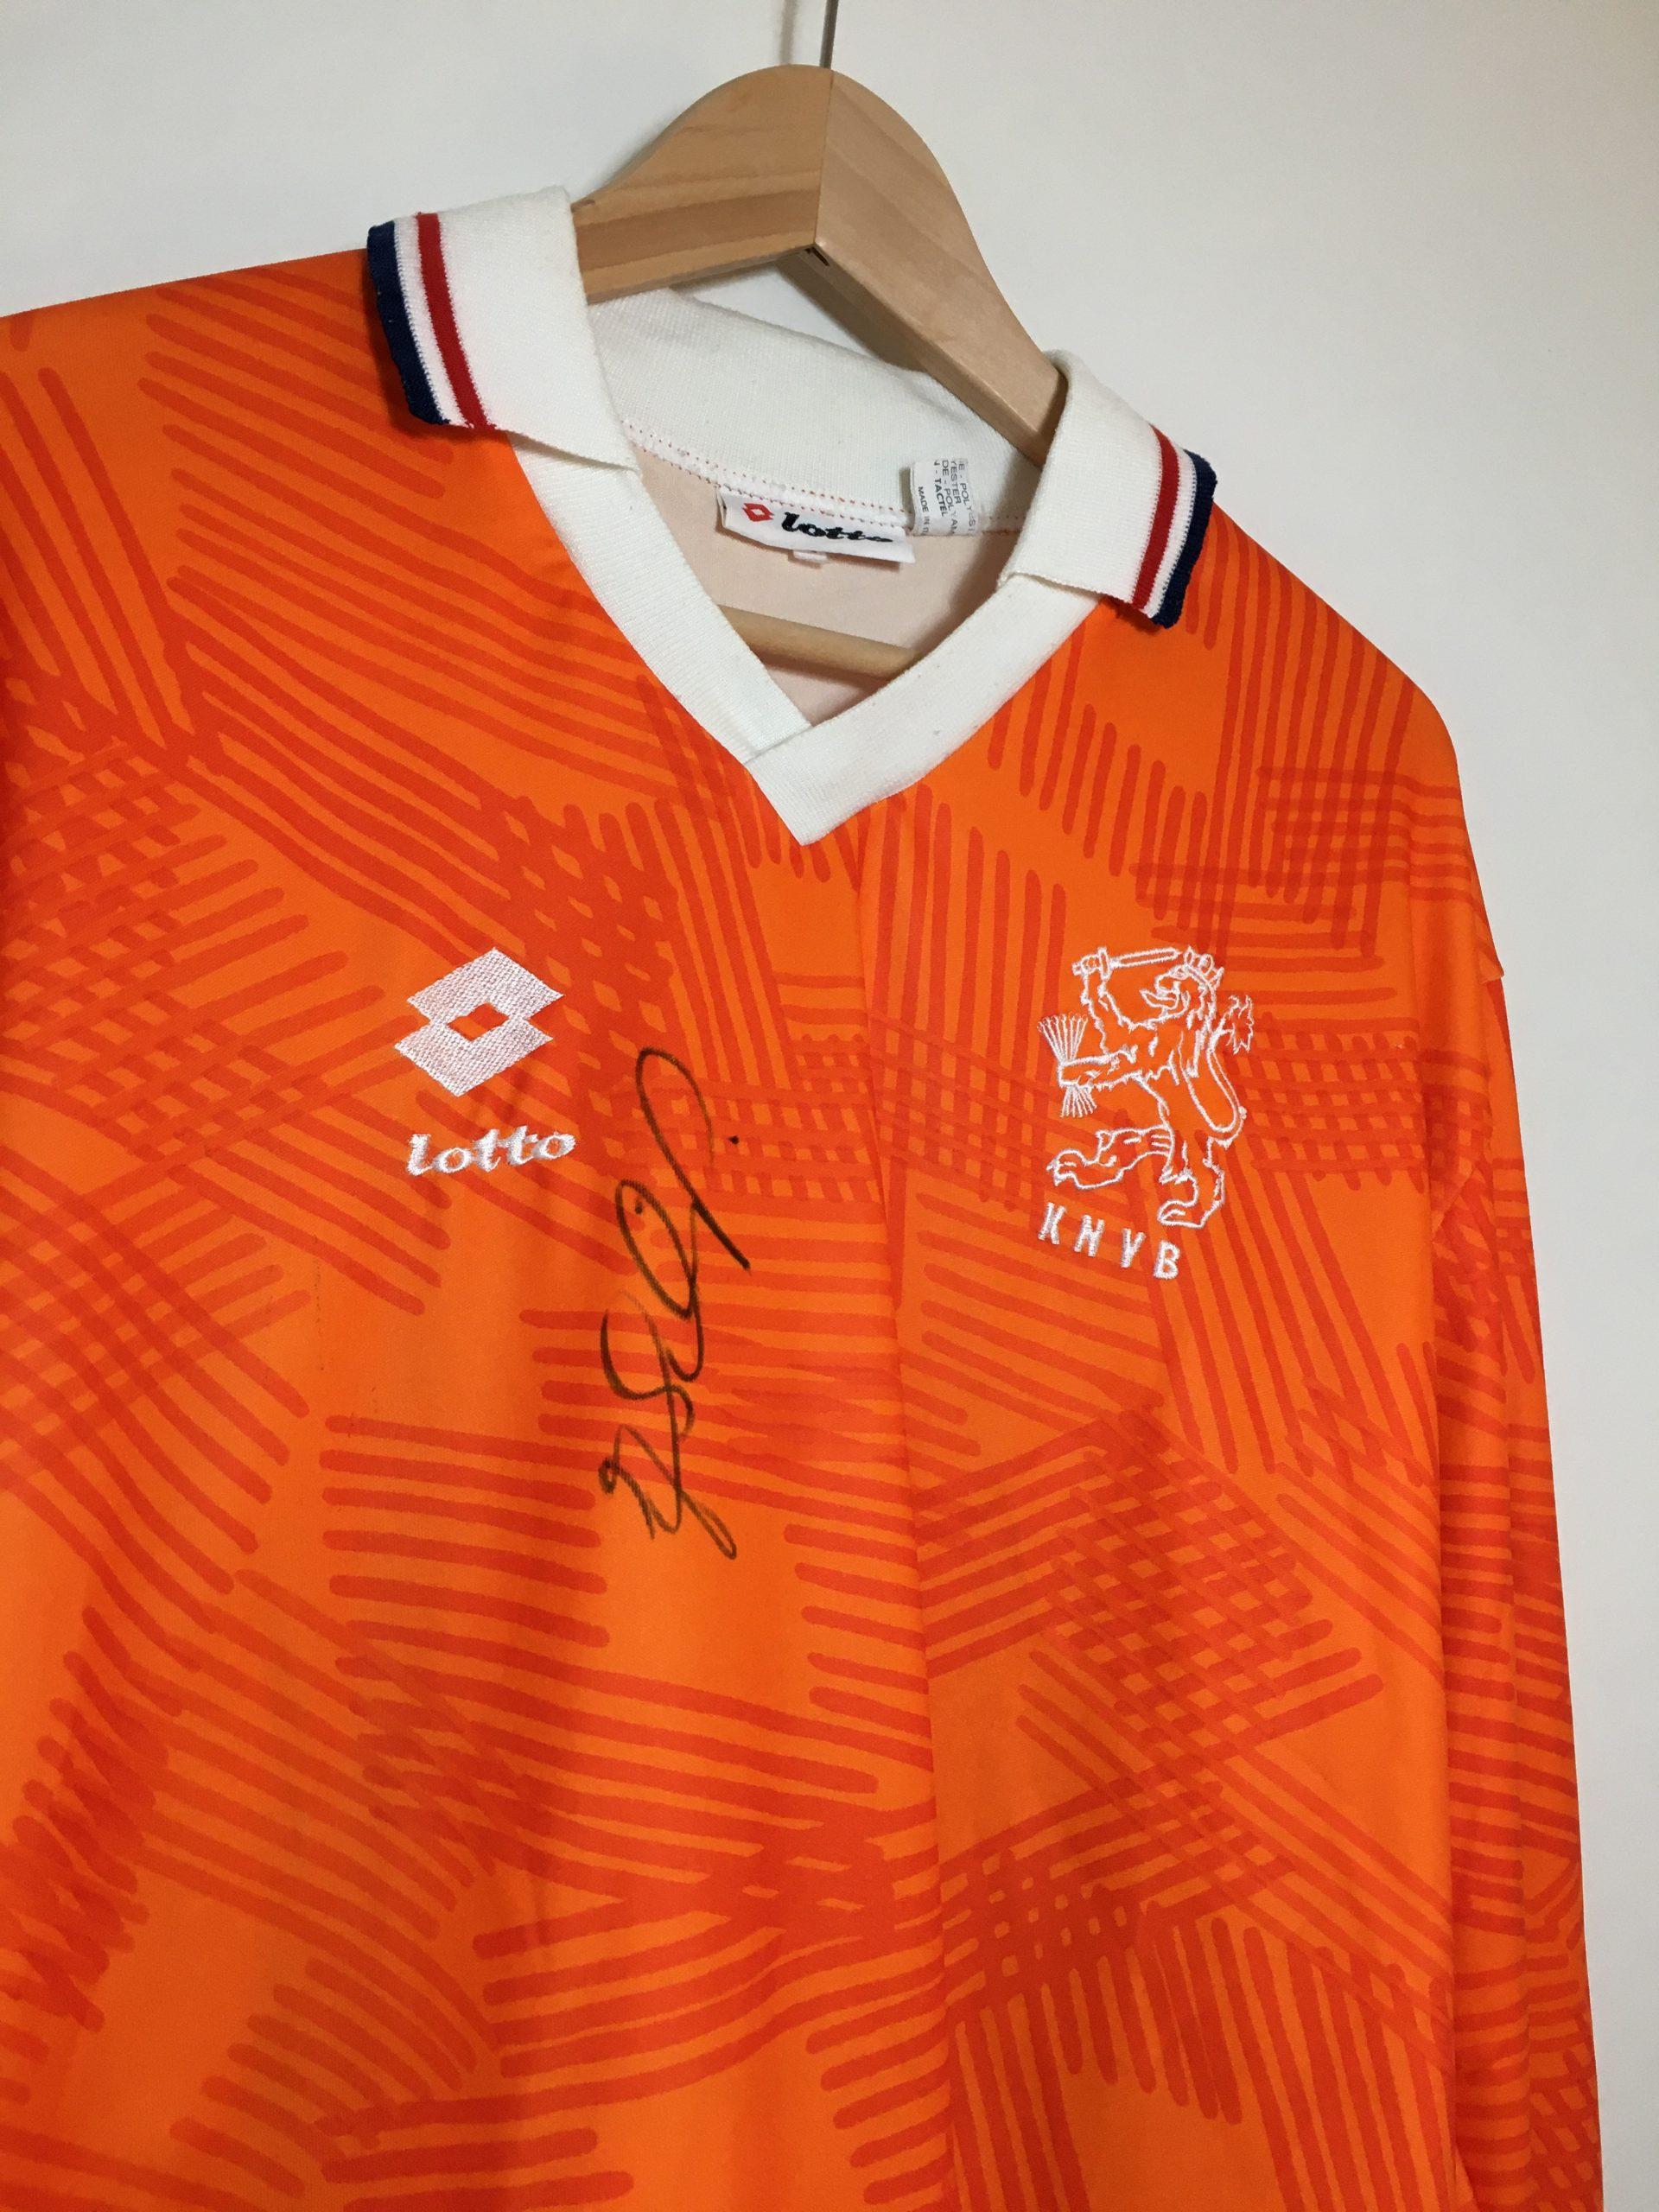 Match Worn Netherlands Holland L S Home Shirt 1991 By John Van T Schip 14 With Signature Football Vintage Amsterdam